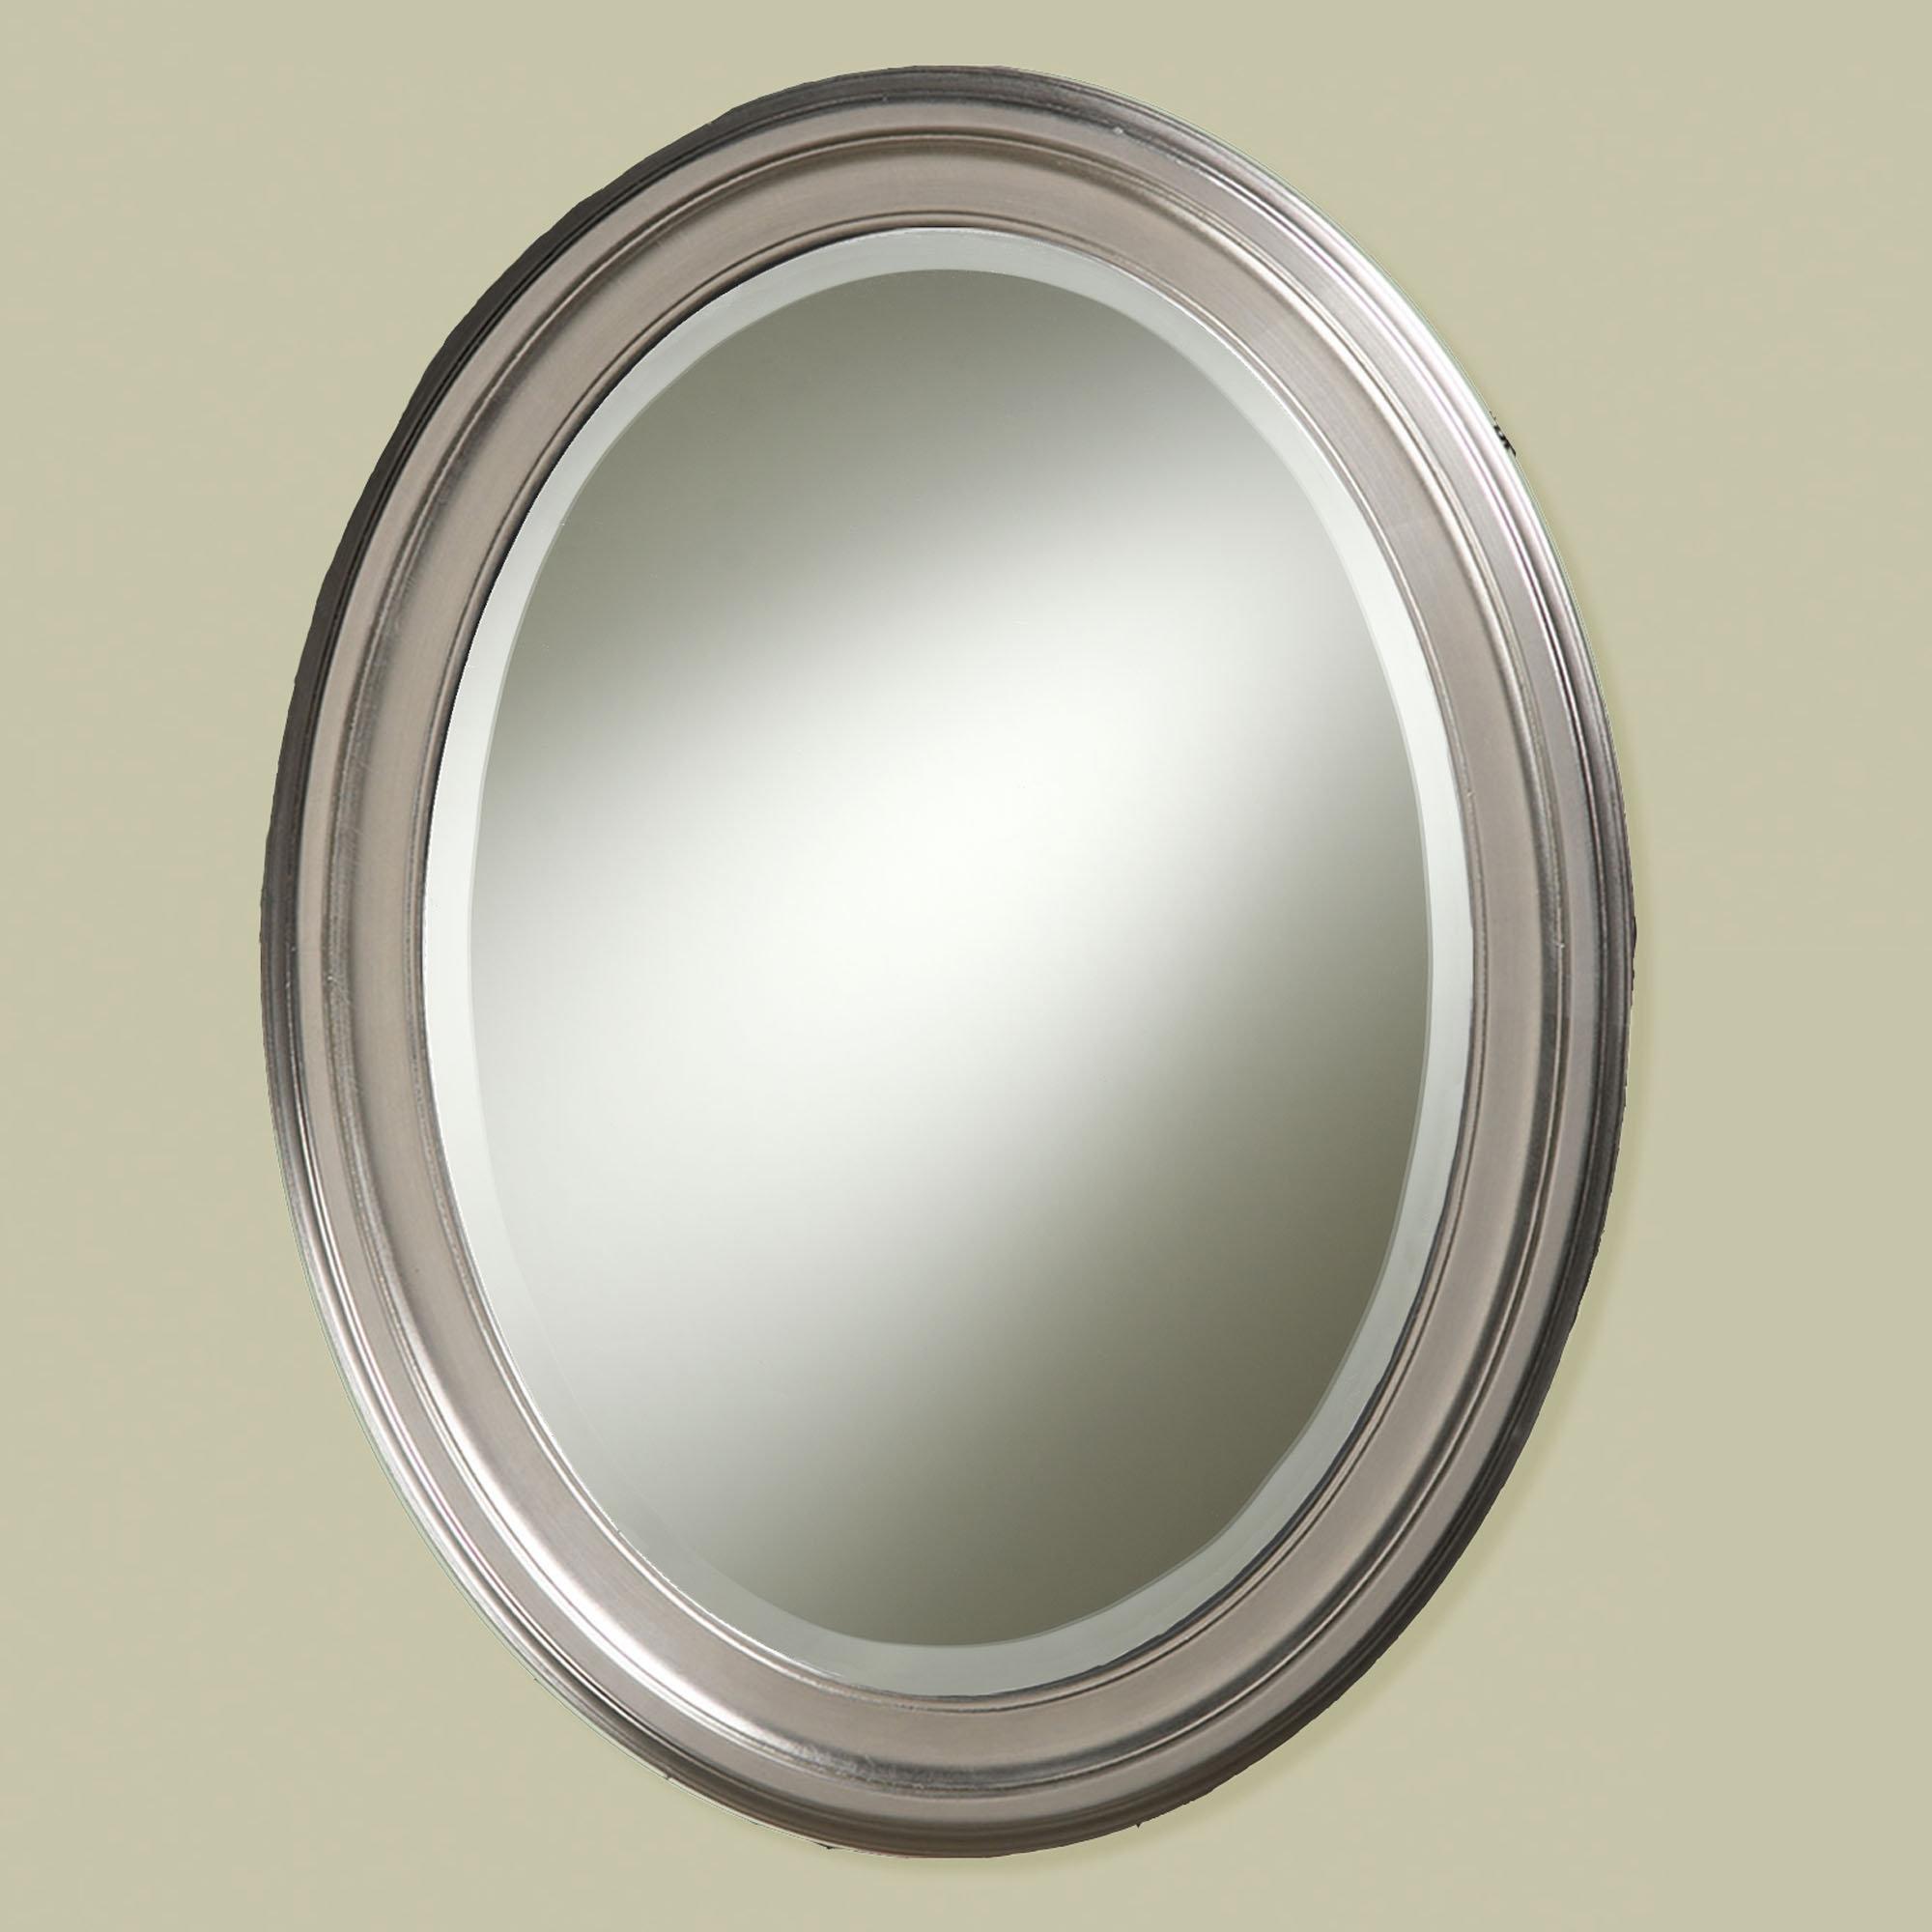 Brushed Nickel Bathroom Mirror Oval